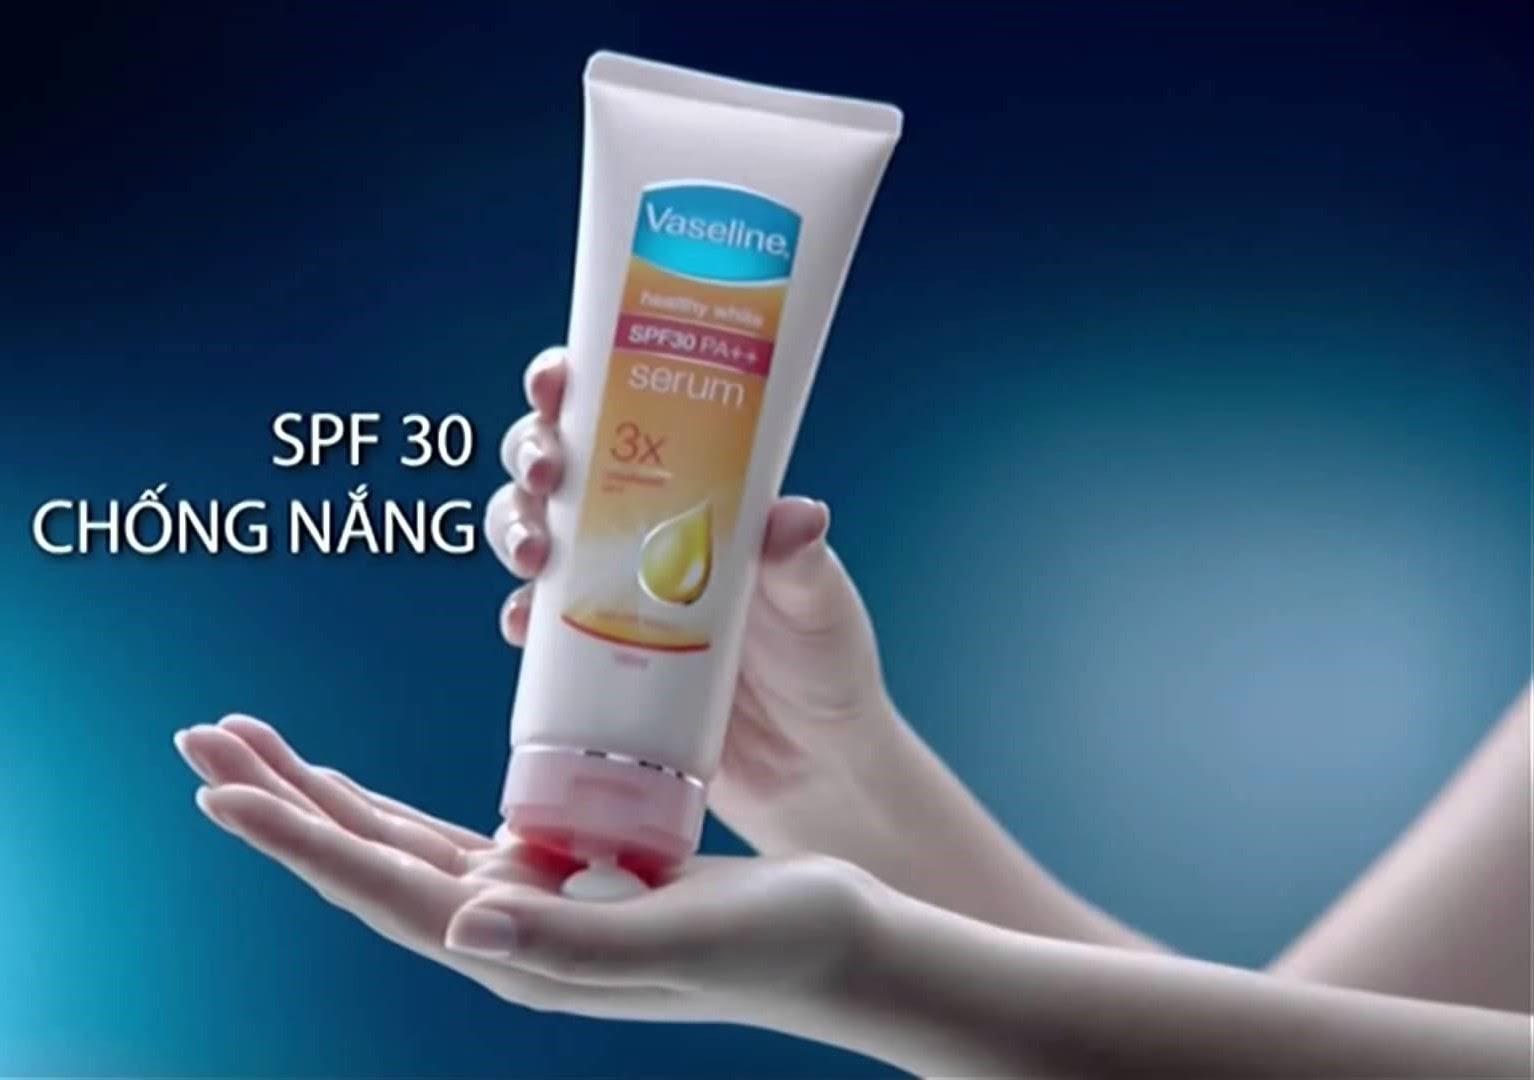 sua-duong-the-vaseline-healthy-white-serum